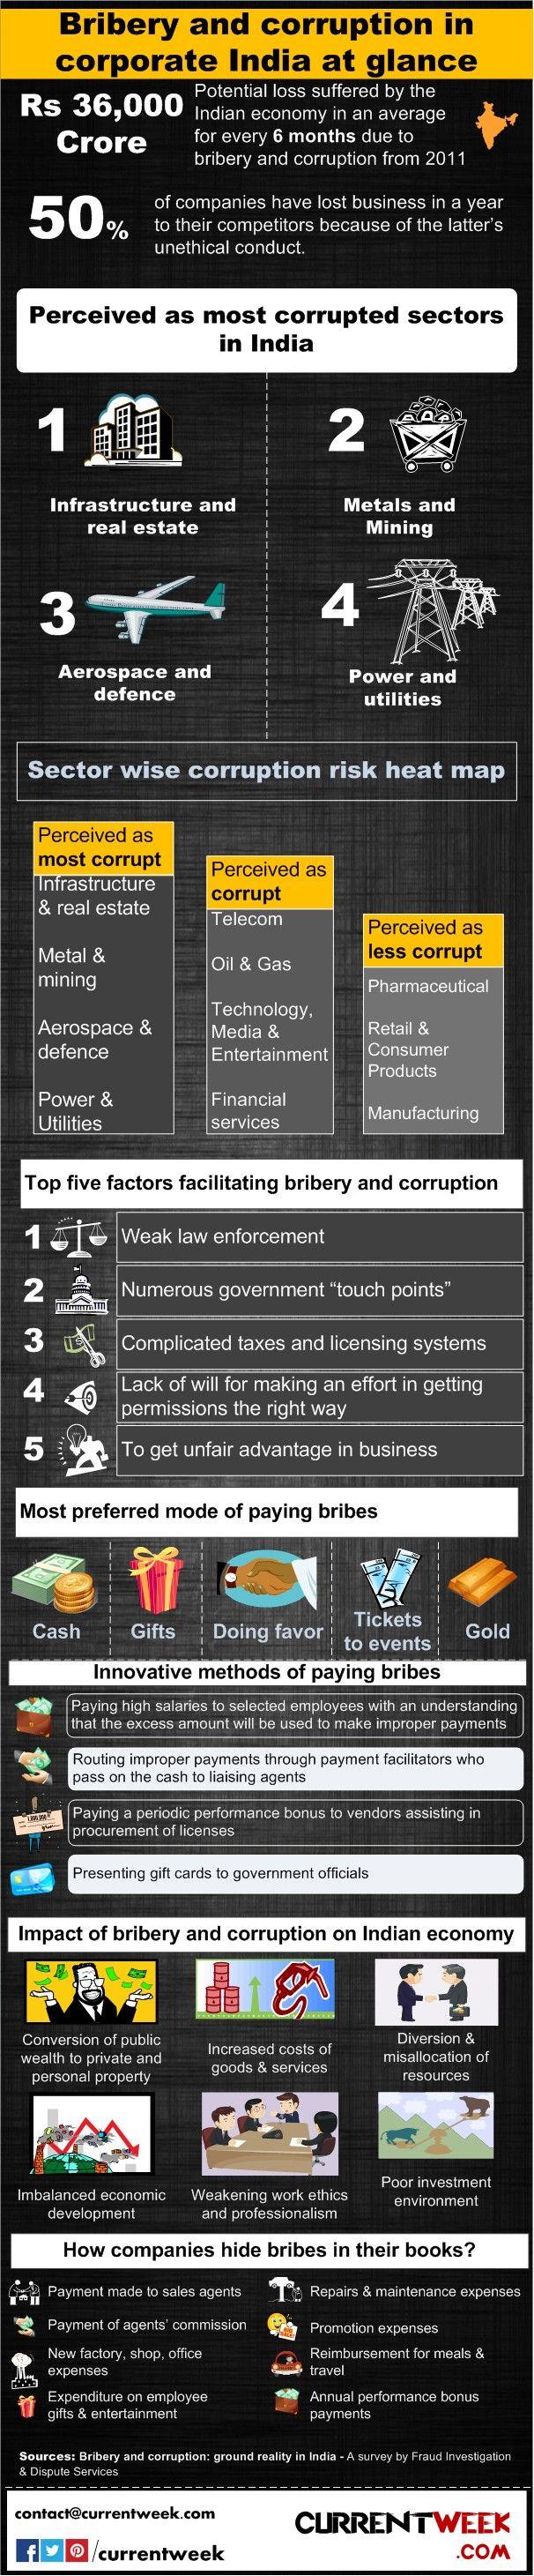 Bribery and corruption in India. Politics vs corporates - Facts in Infographic